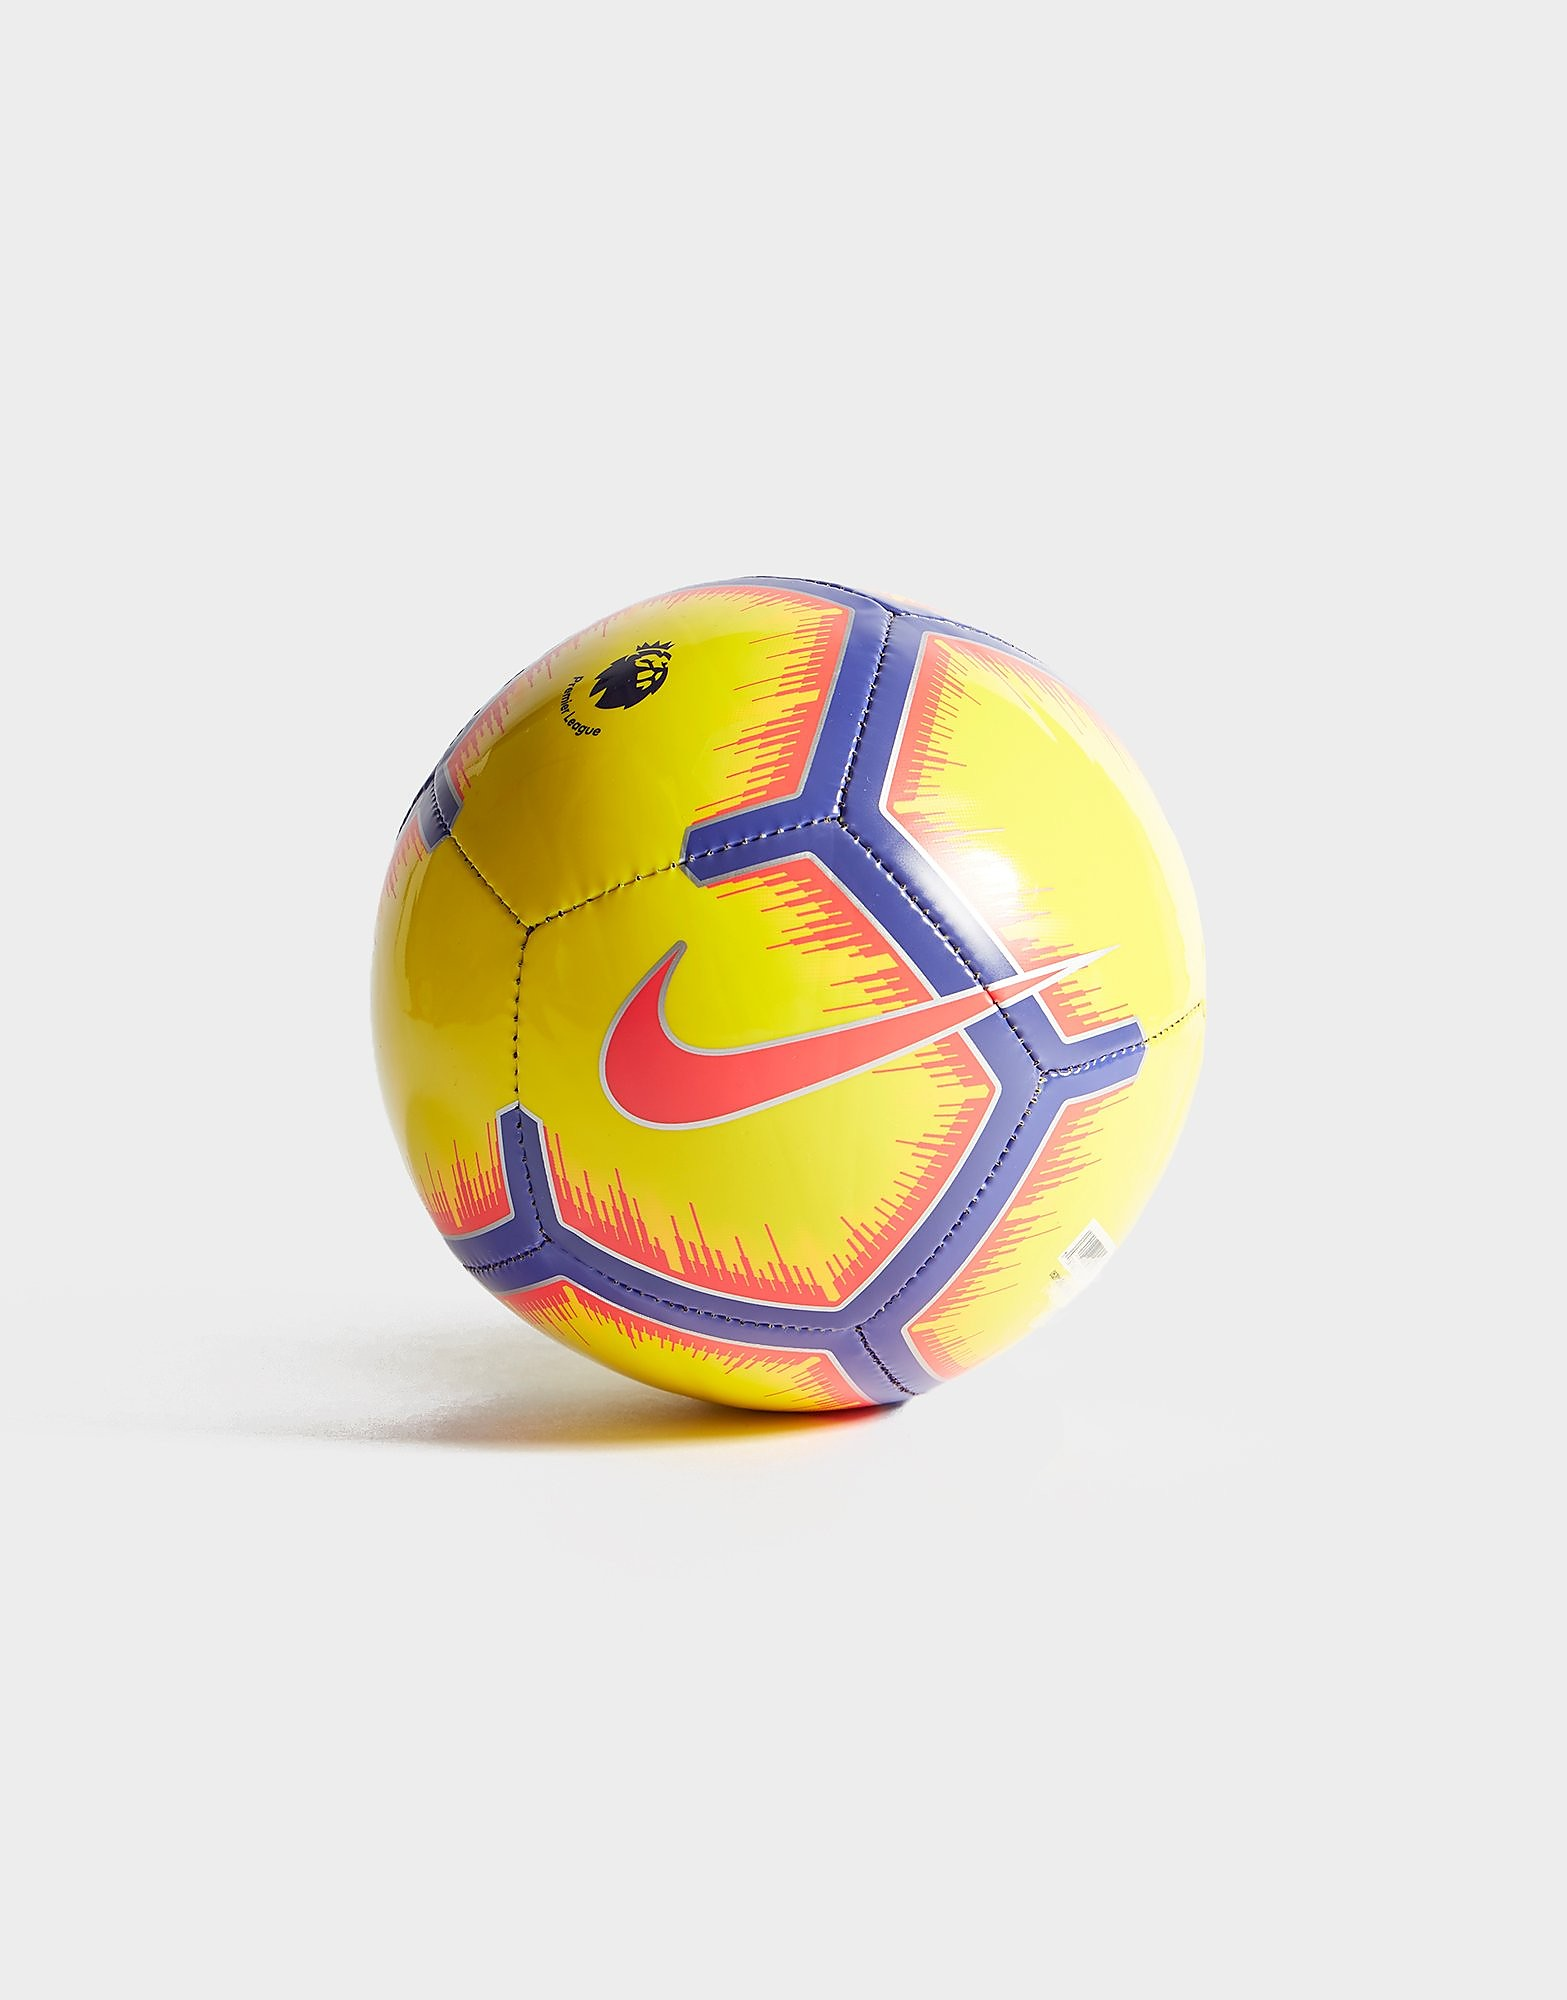 Nike Premier League 2018/19 High Visibility Football